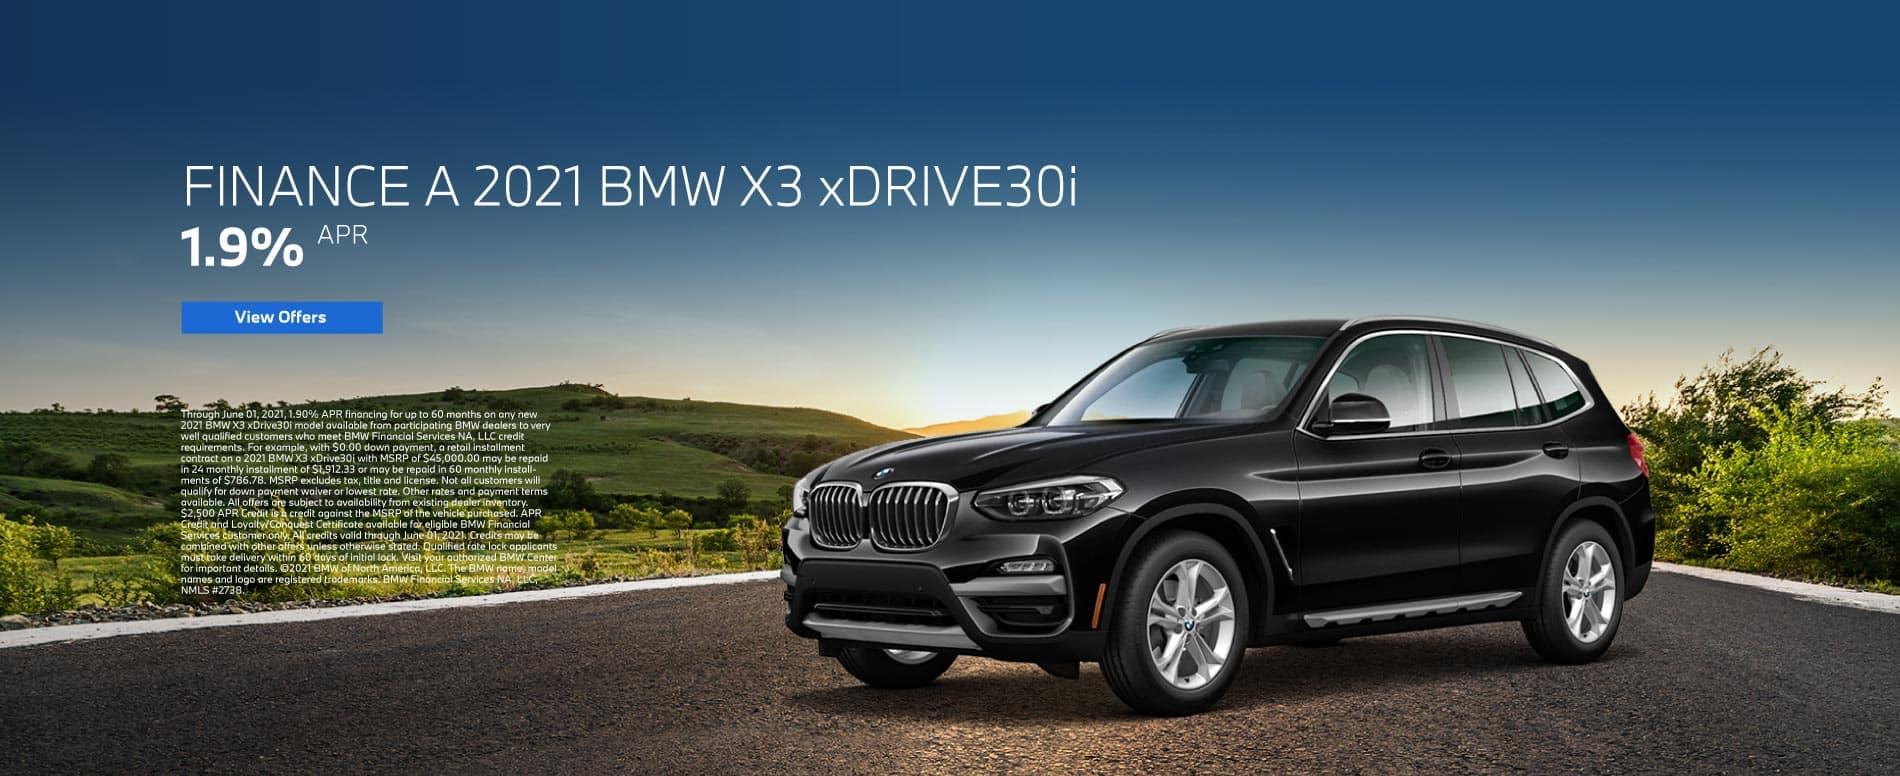 Finance a 2021 BMW X3 xDRIVE30i at 1.9% apr | View Offers